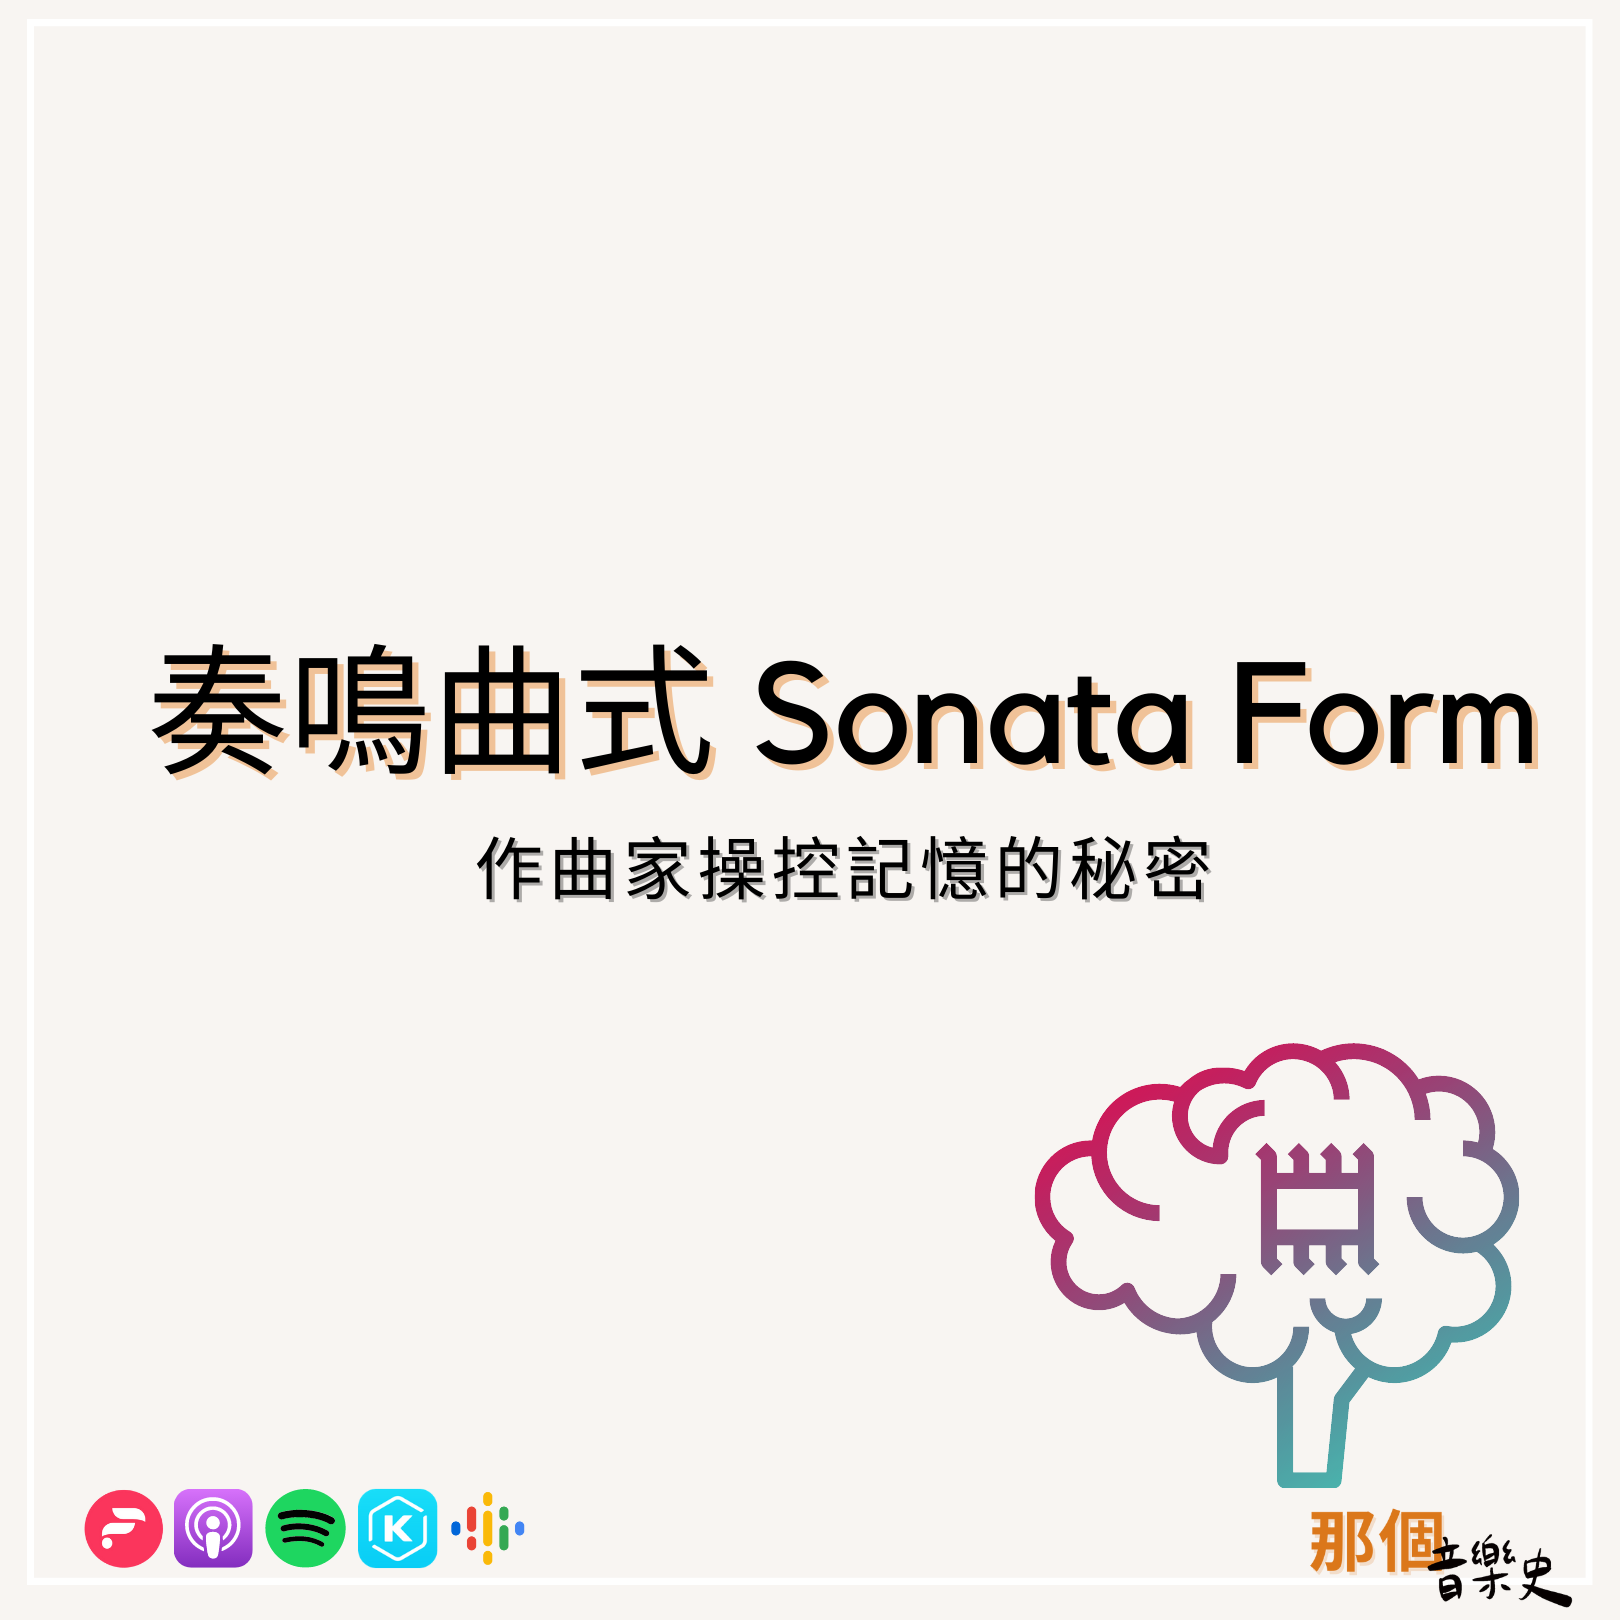 【奏鳴曲式 Sonata Form】作曲家操控記憶的秘密